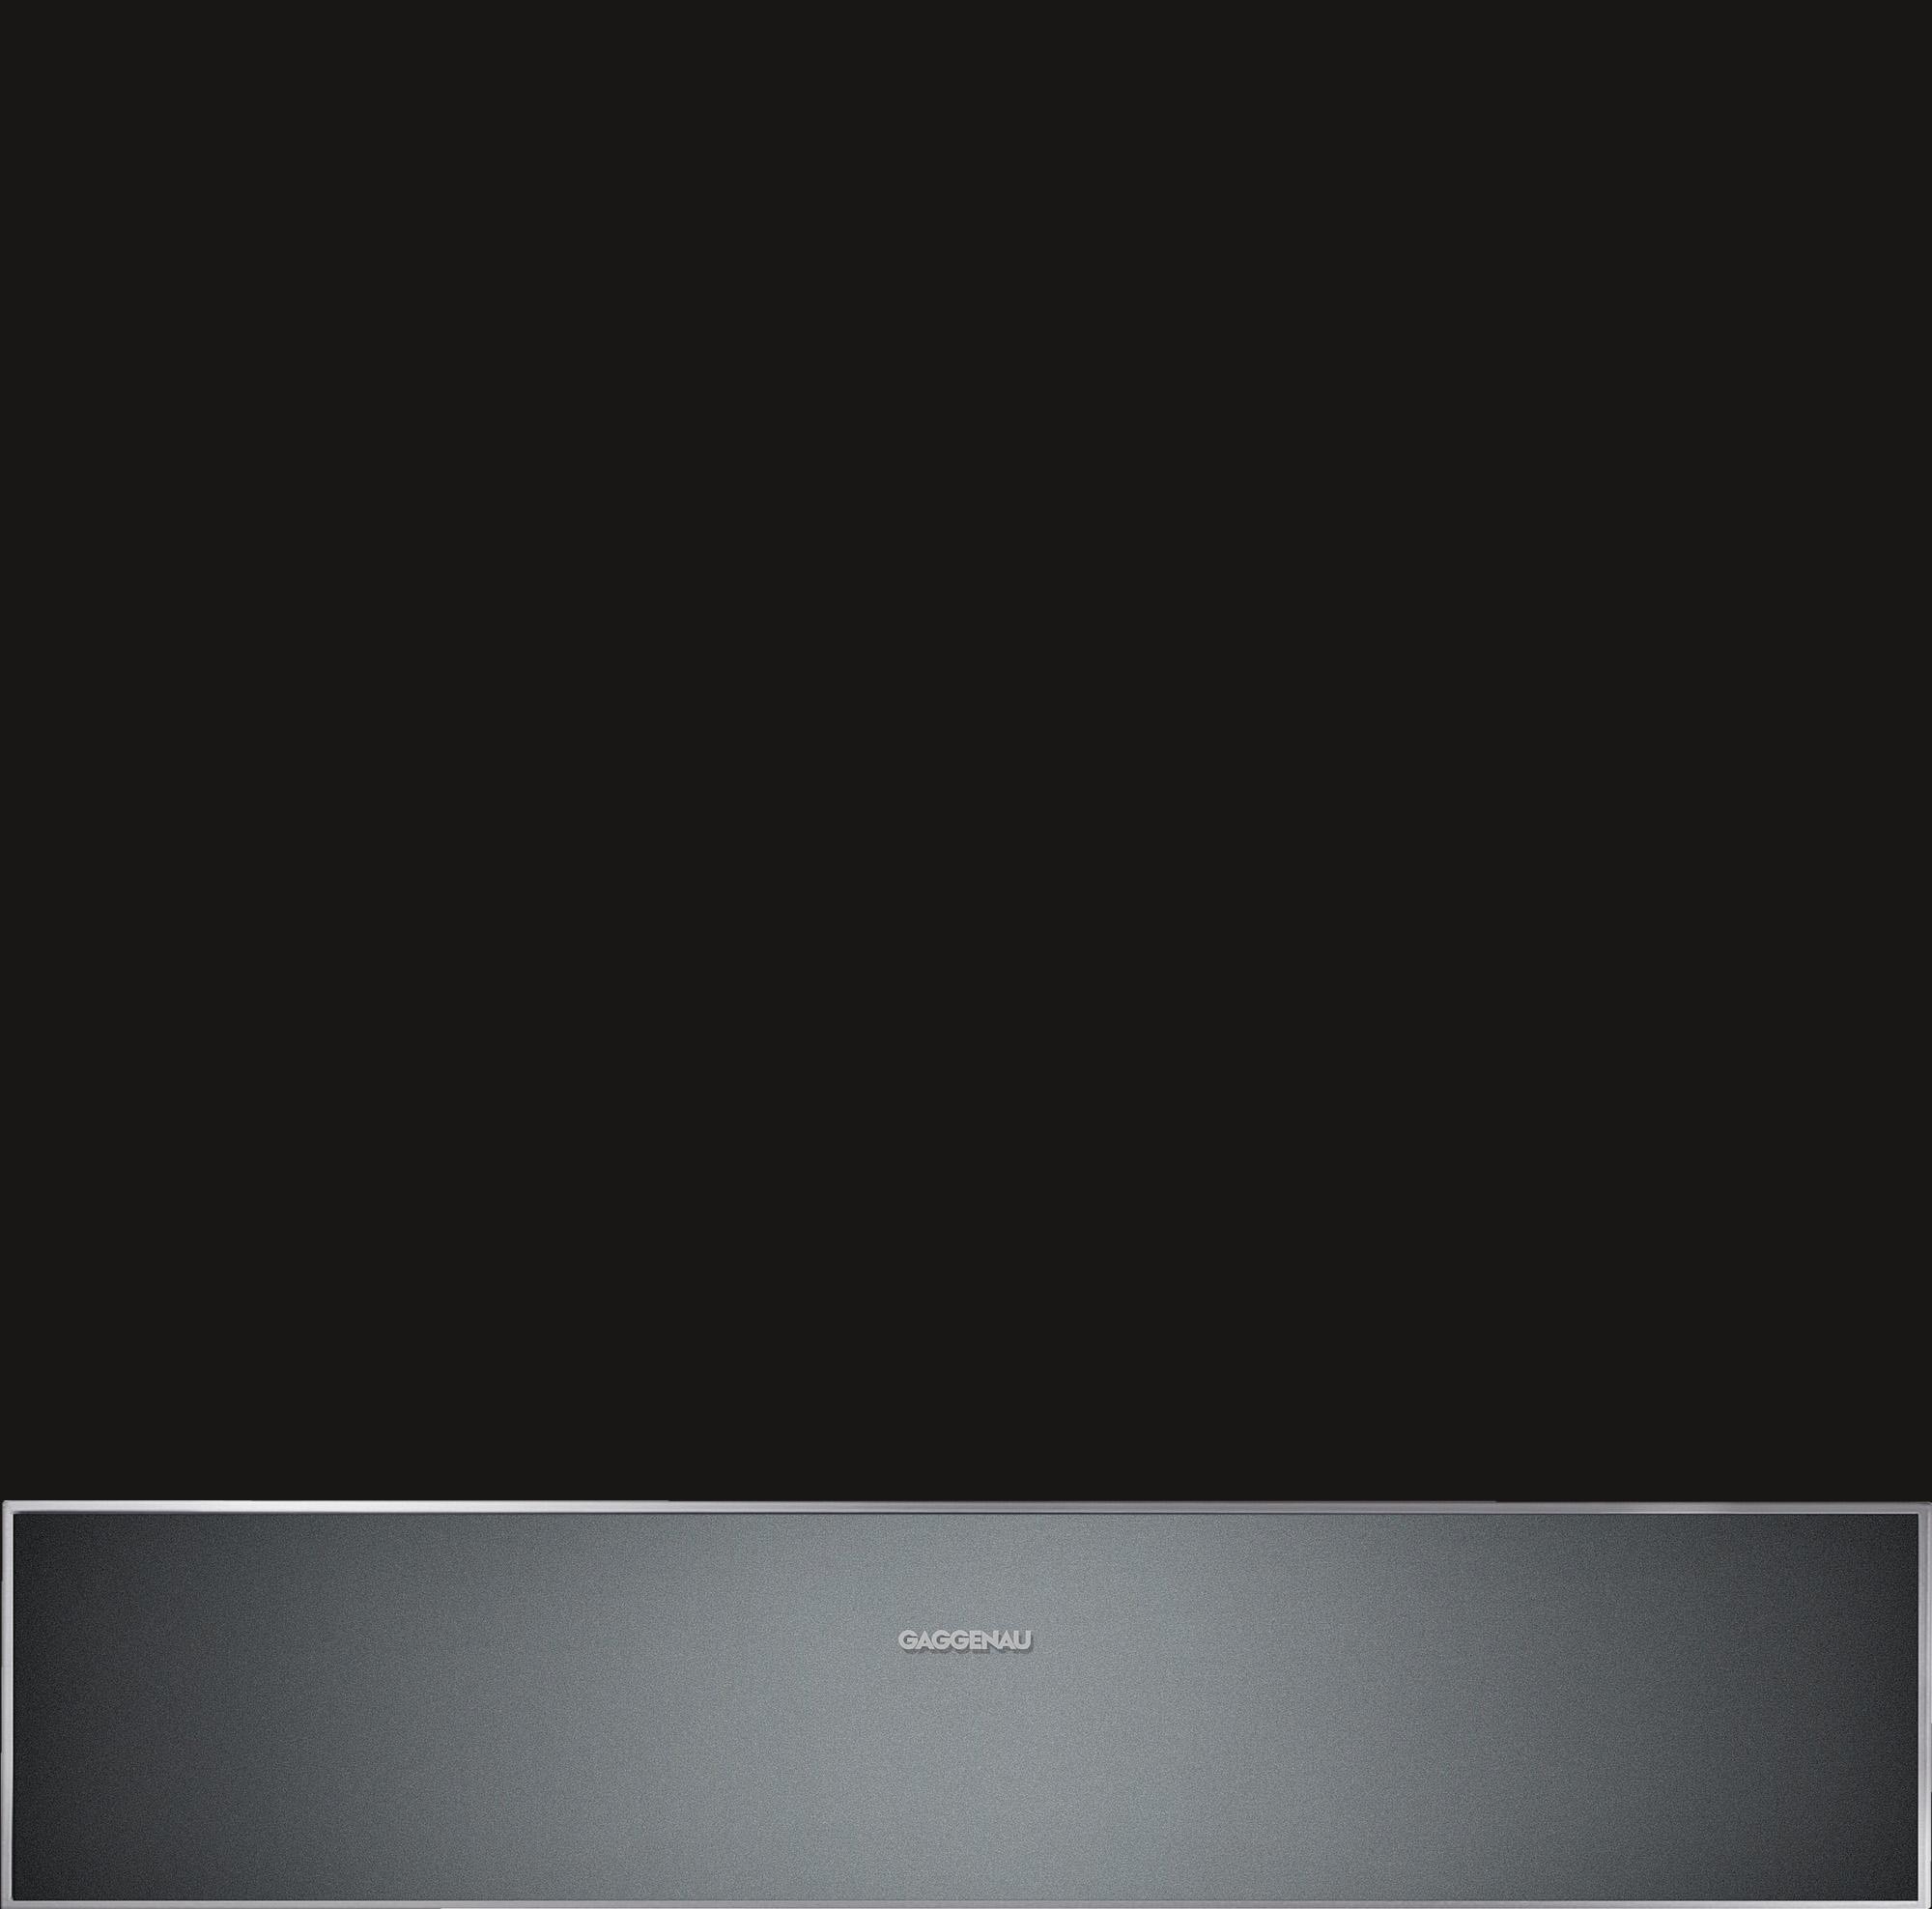 Шафа  для вакуумізаціїї DV461100 GAGGENAU